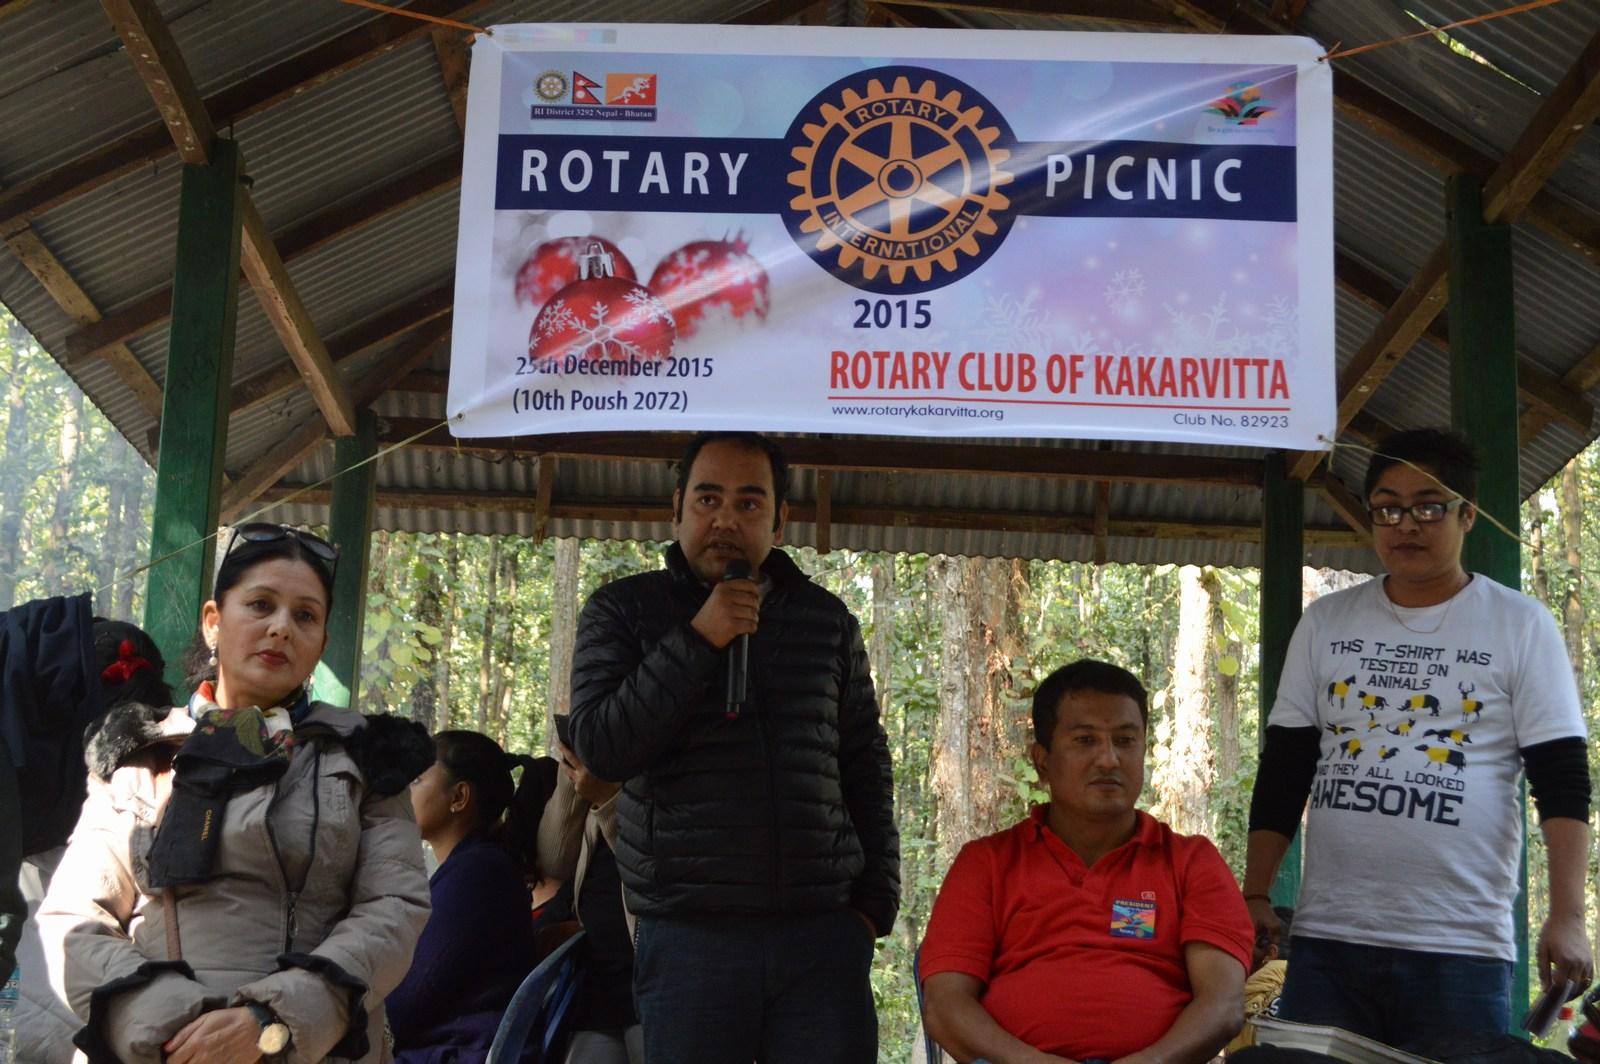 Rota Picnc 2015 50